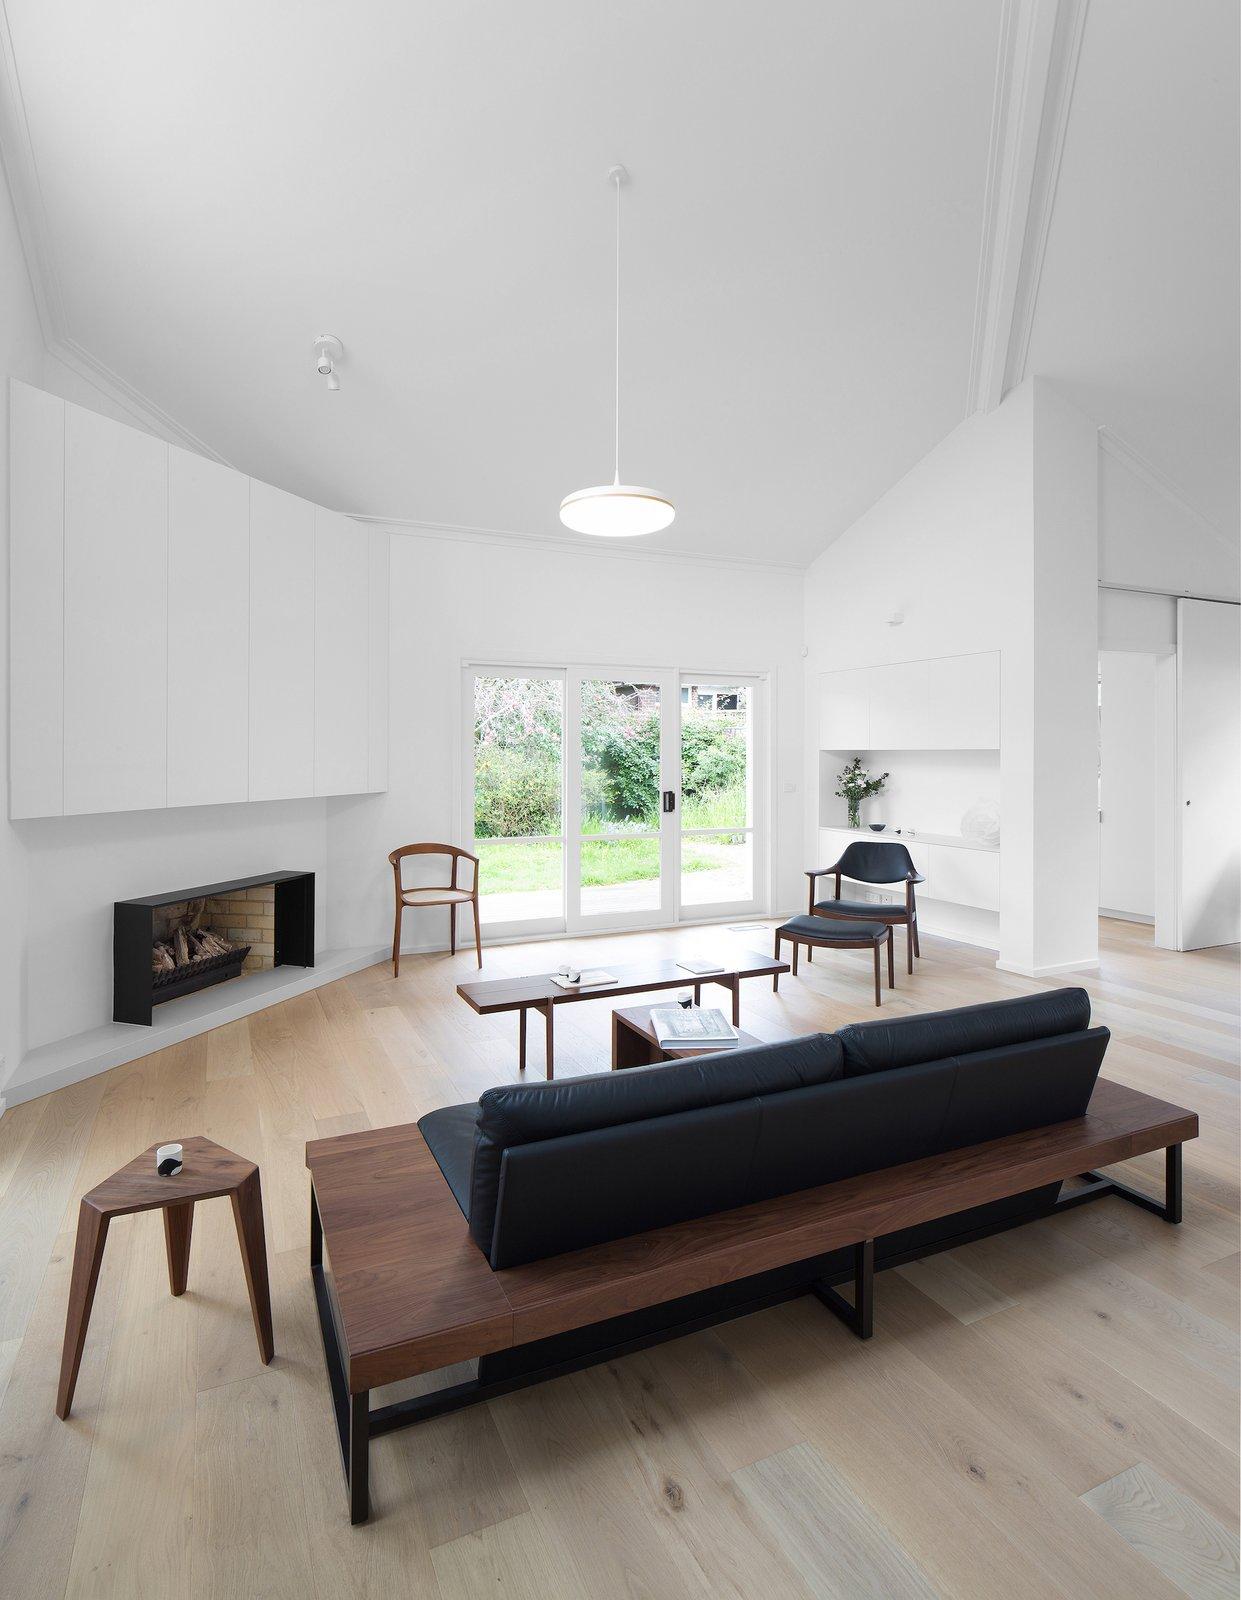 Living Room, Pendant Lighting, Chair, Coffee Tables, Bench, Wood Burning Fireplace, and Light Hardwood Floor  Corhampton Rd Residence